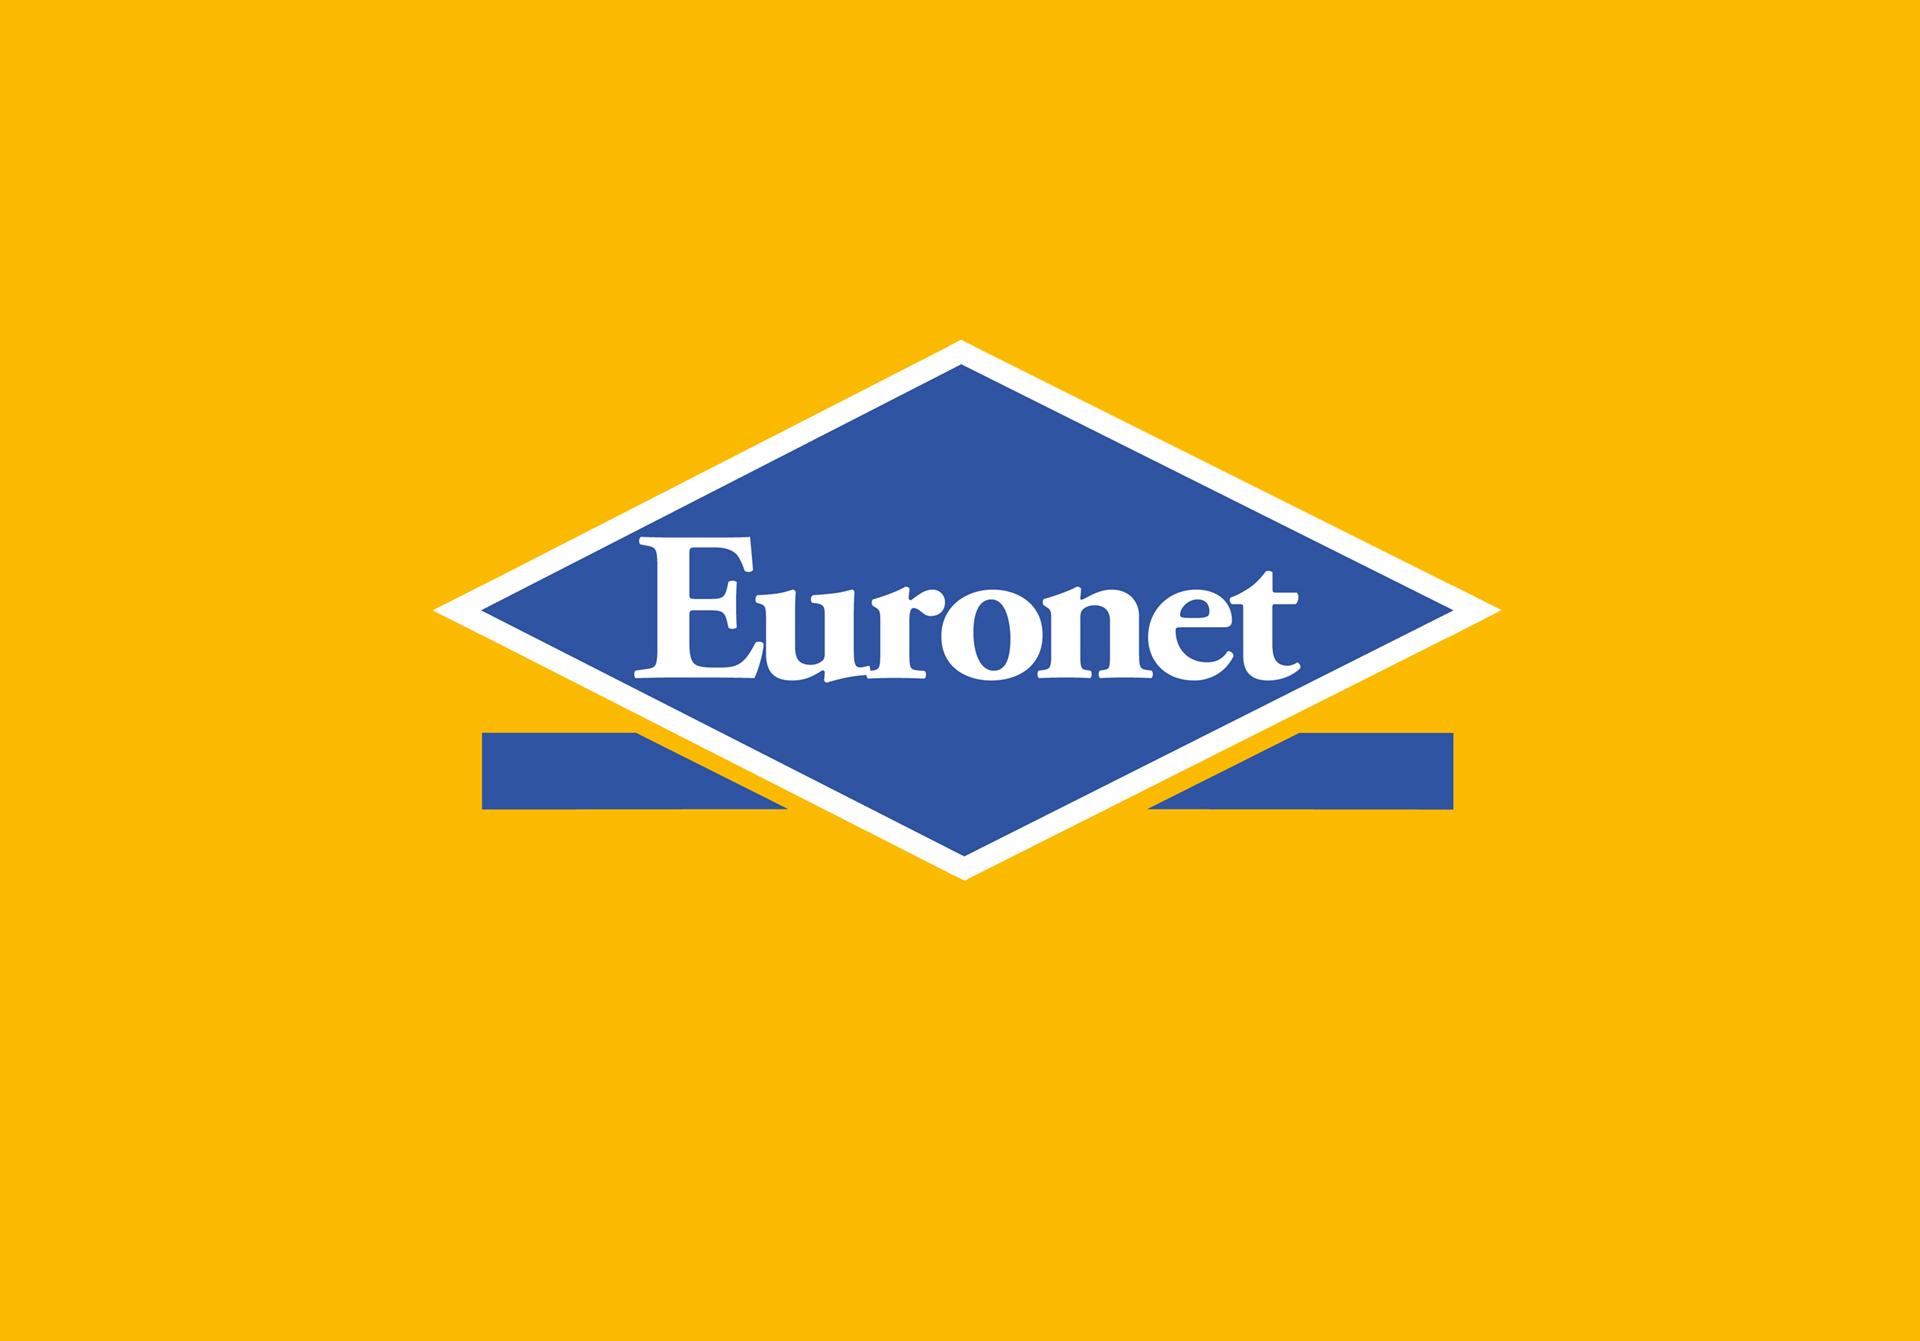 Euronet - Geldautomat - ATM Augsburg